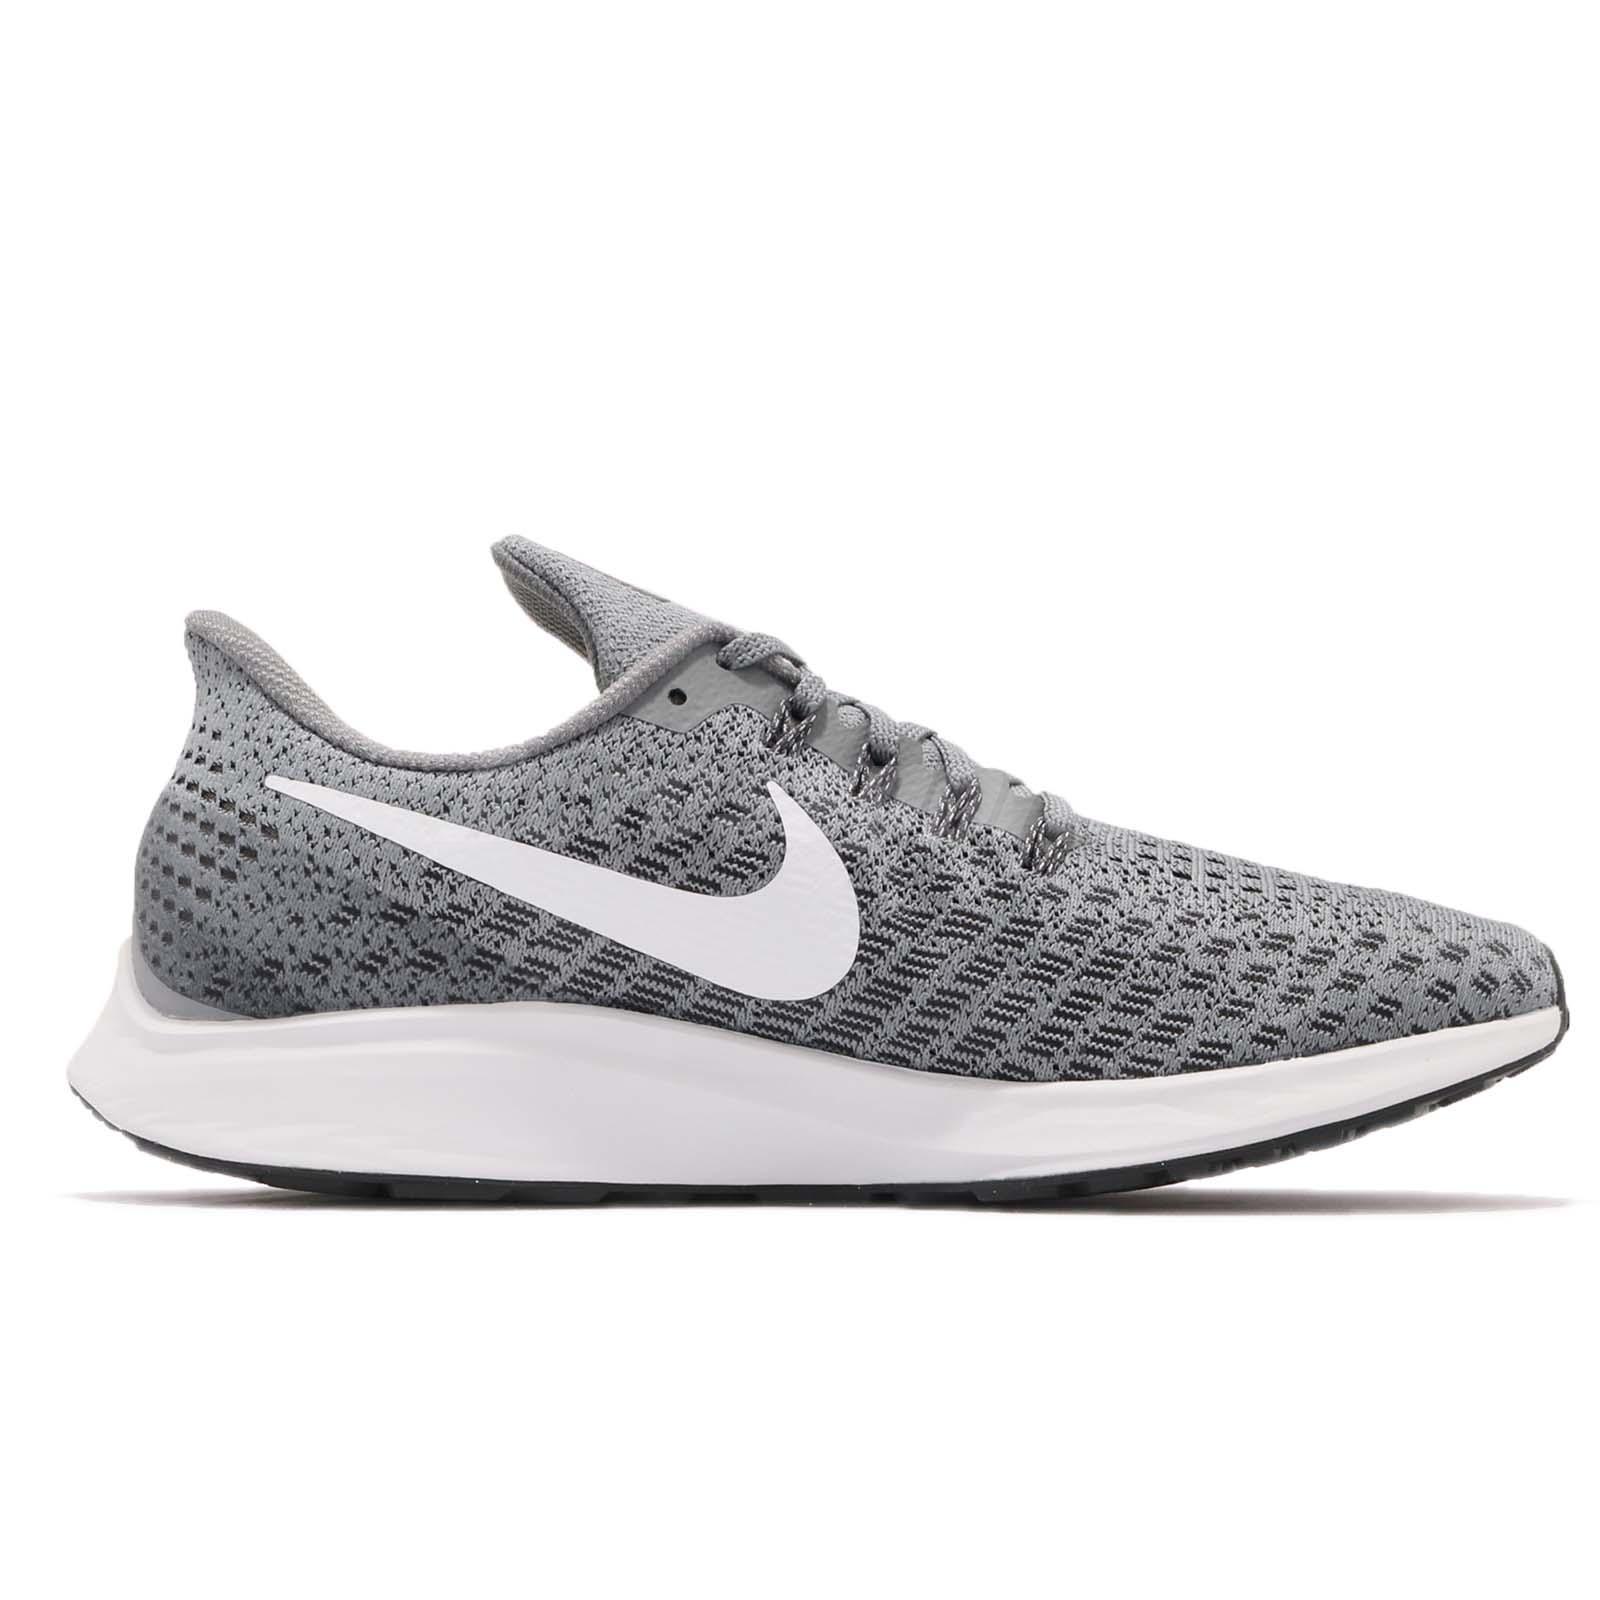 790eb3c6eef69 Nike Air Zoom Pegasus 35 Cool Grey White Men Running Shoes Sneakers ...